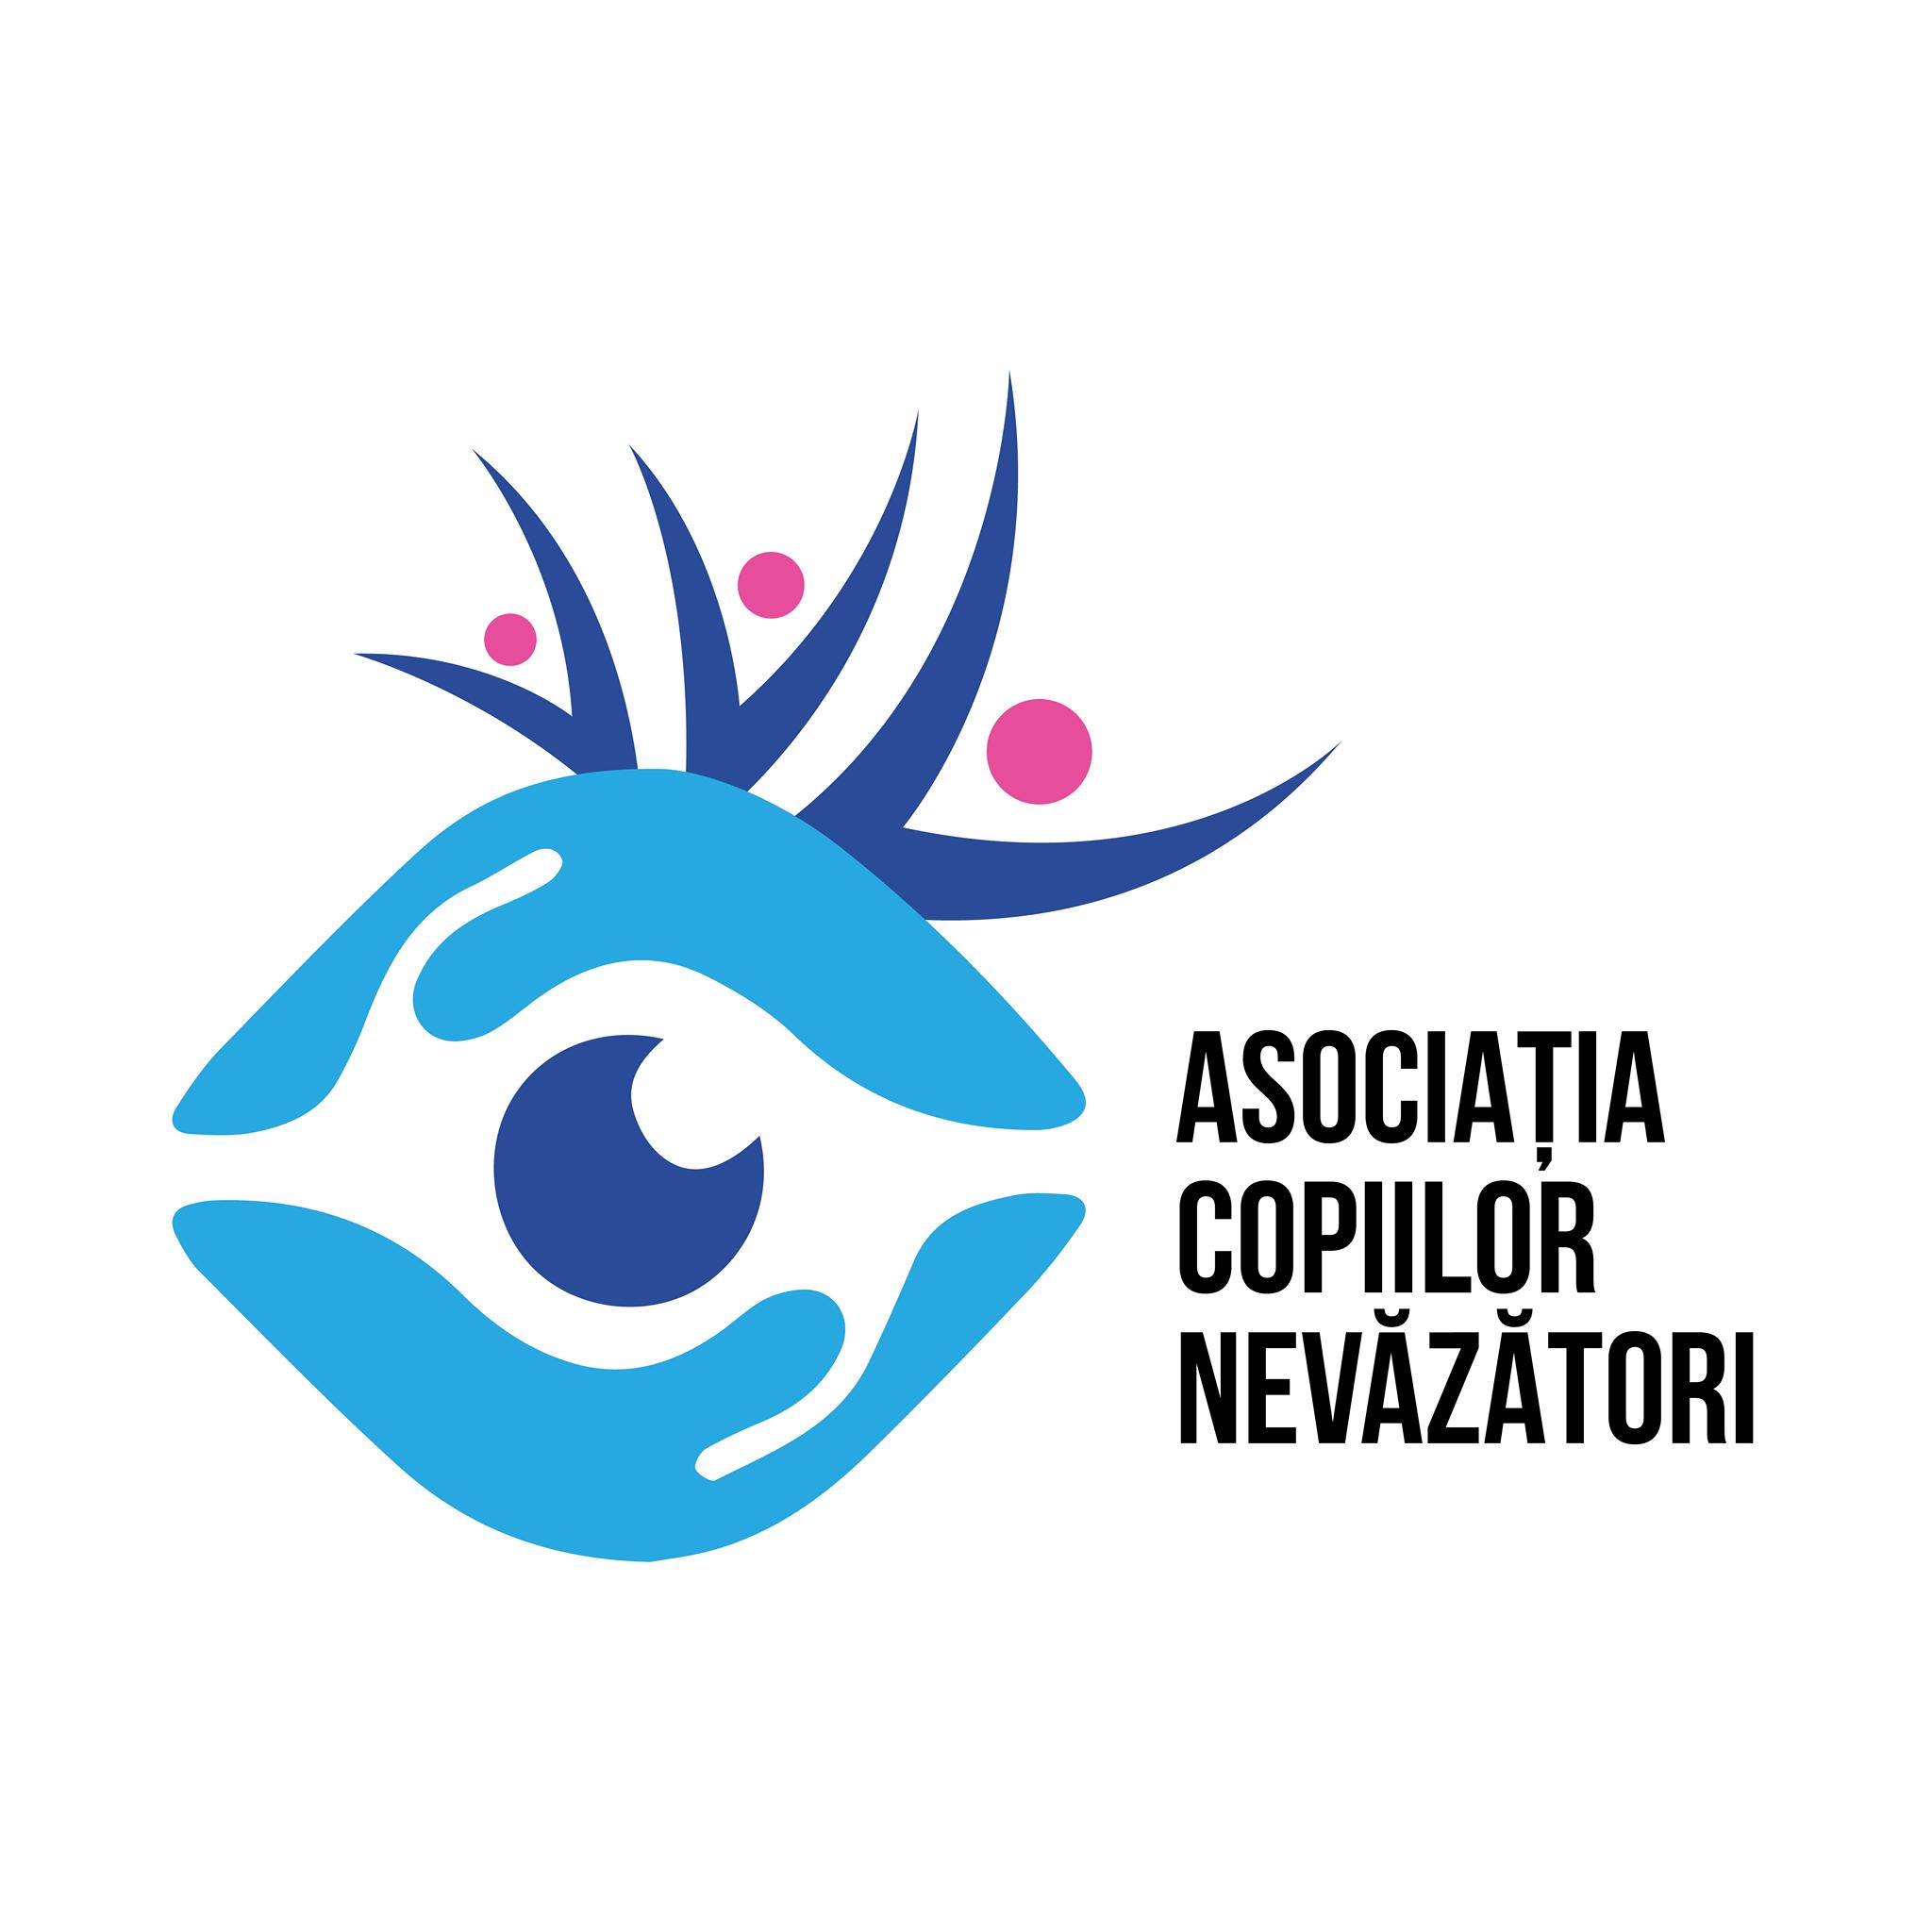 Asociatia Parintilor Copiilor Slab Vazatori si nevazatori logo